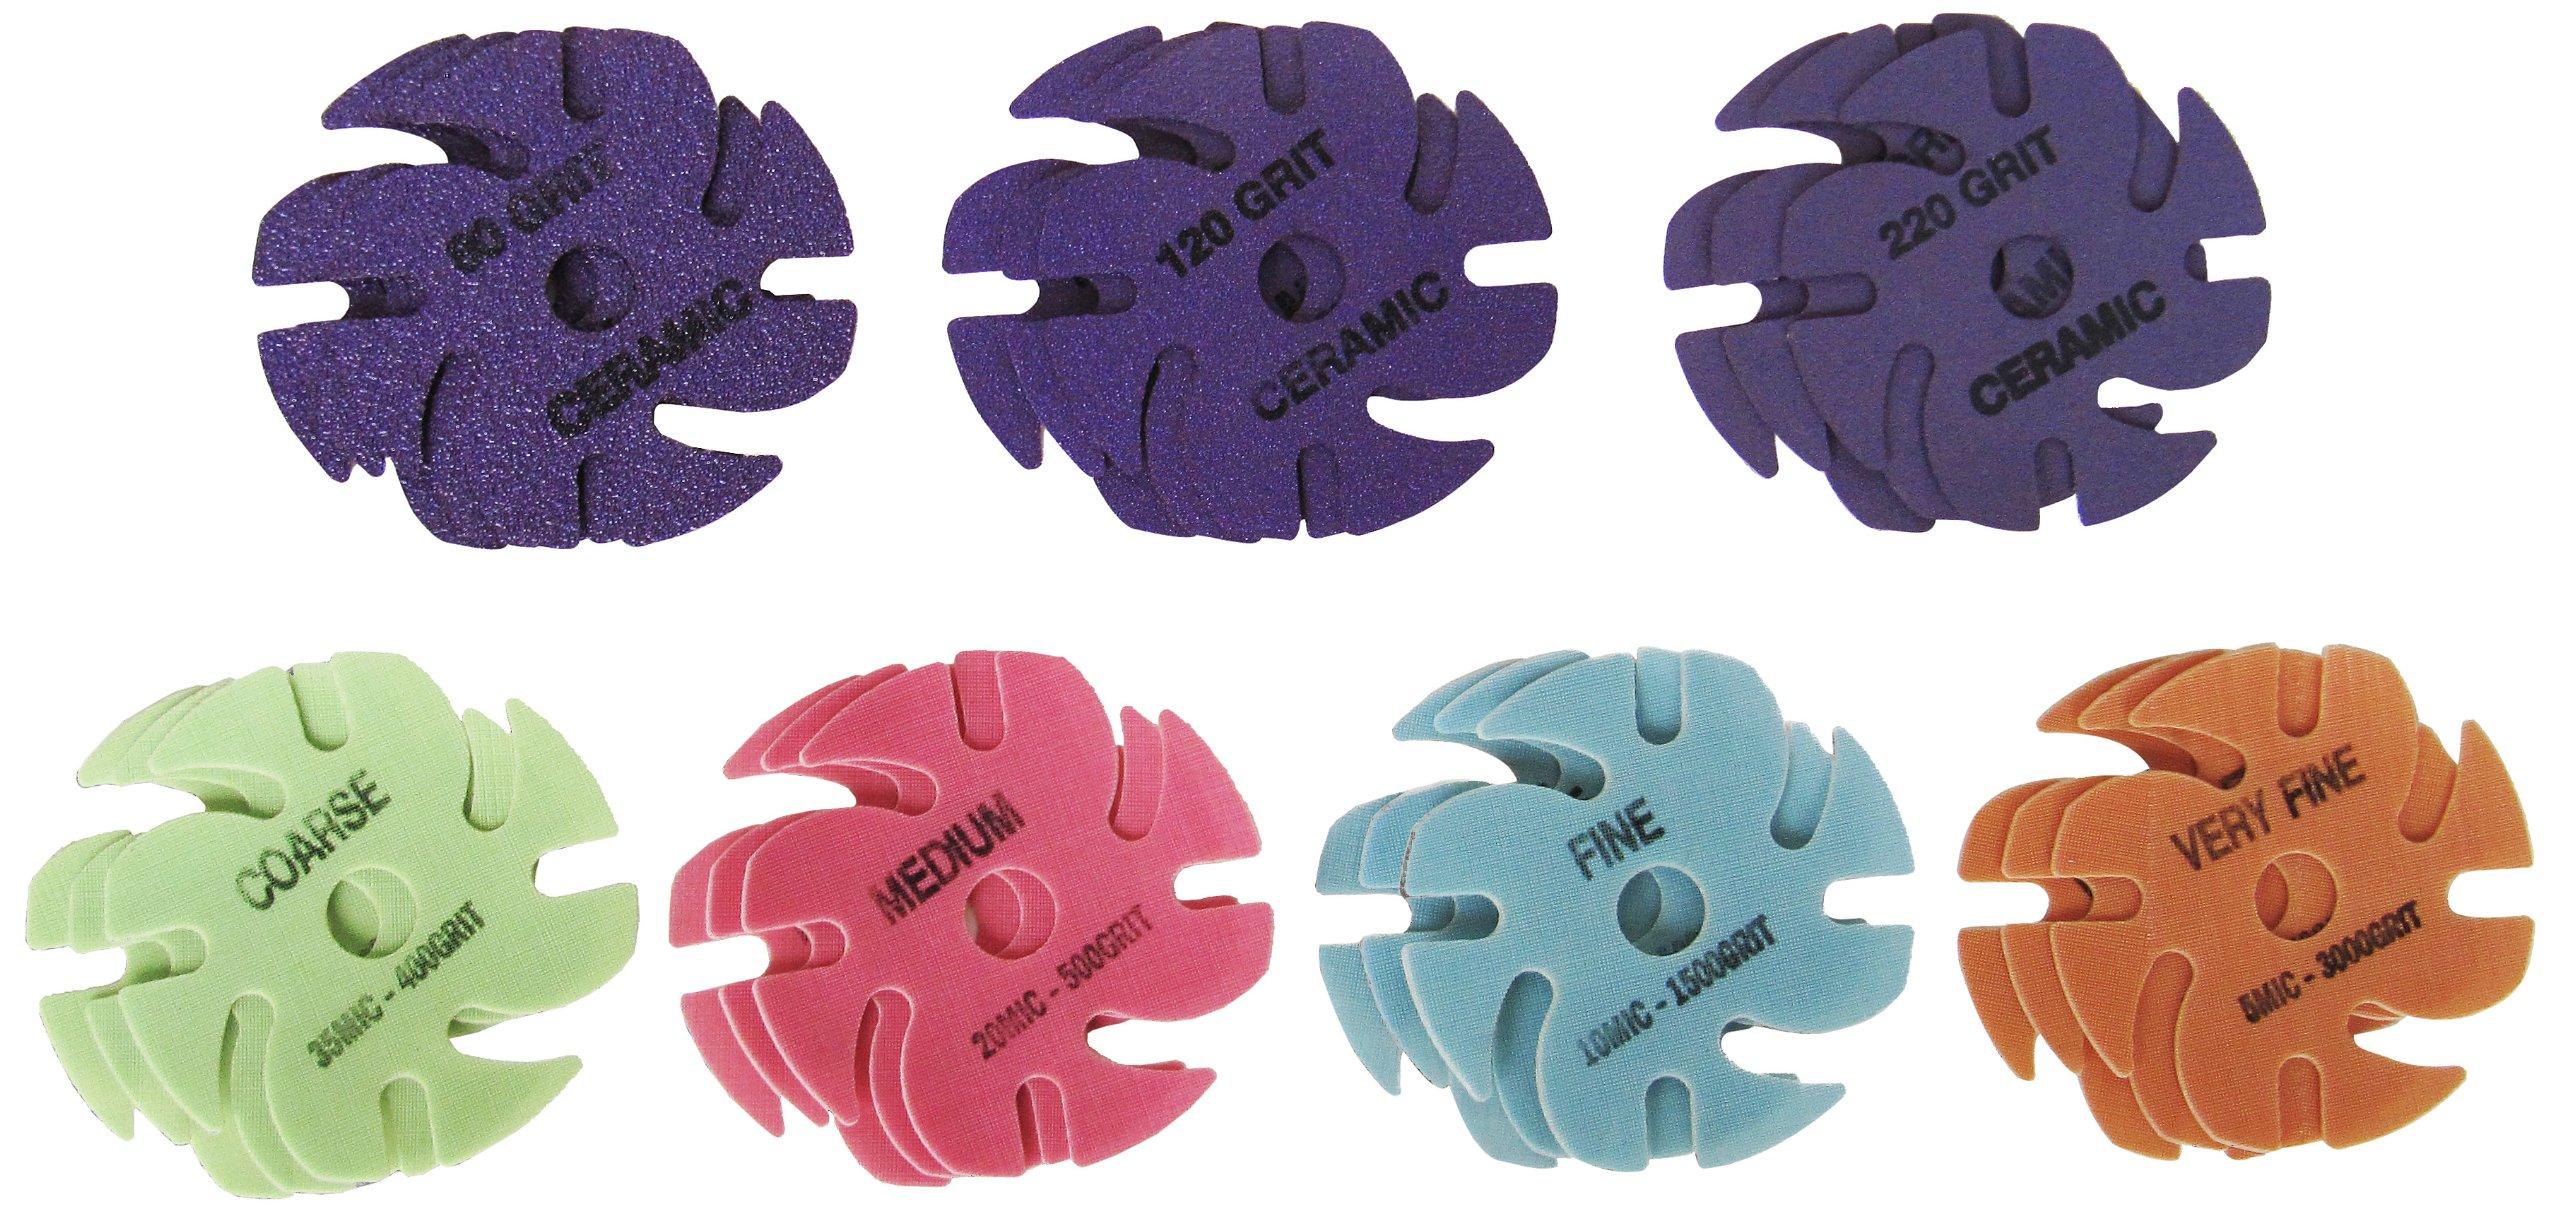 JoolTool 3M Cubitron Ceramic Purple & Trizact: 21 Piece Deluxe Abrasive Disc Kit, 3'' Diameter by JoolTool (Image #1)